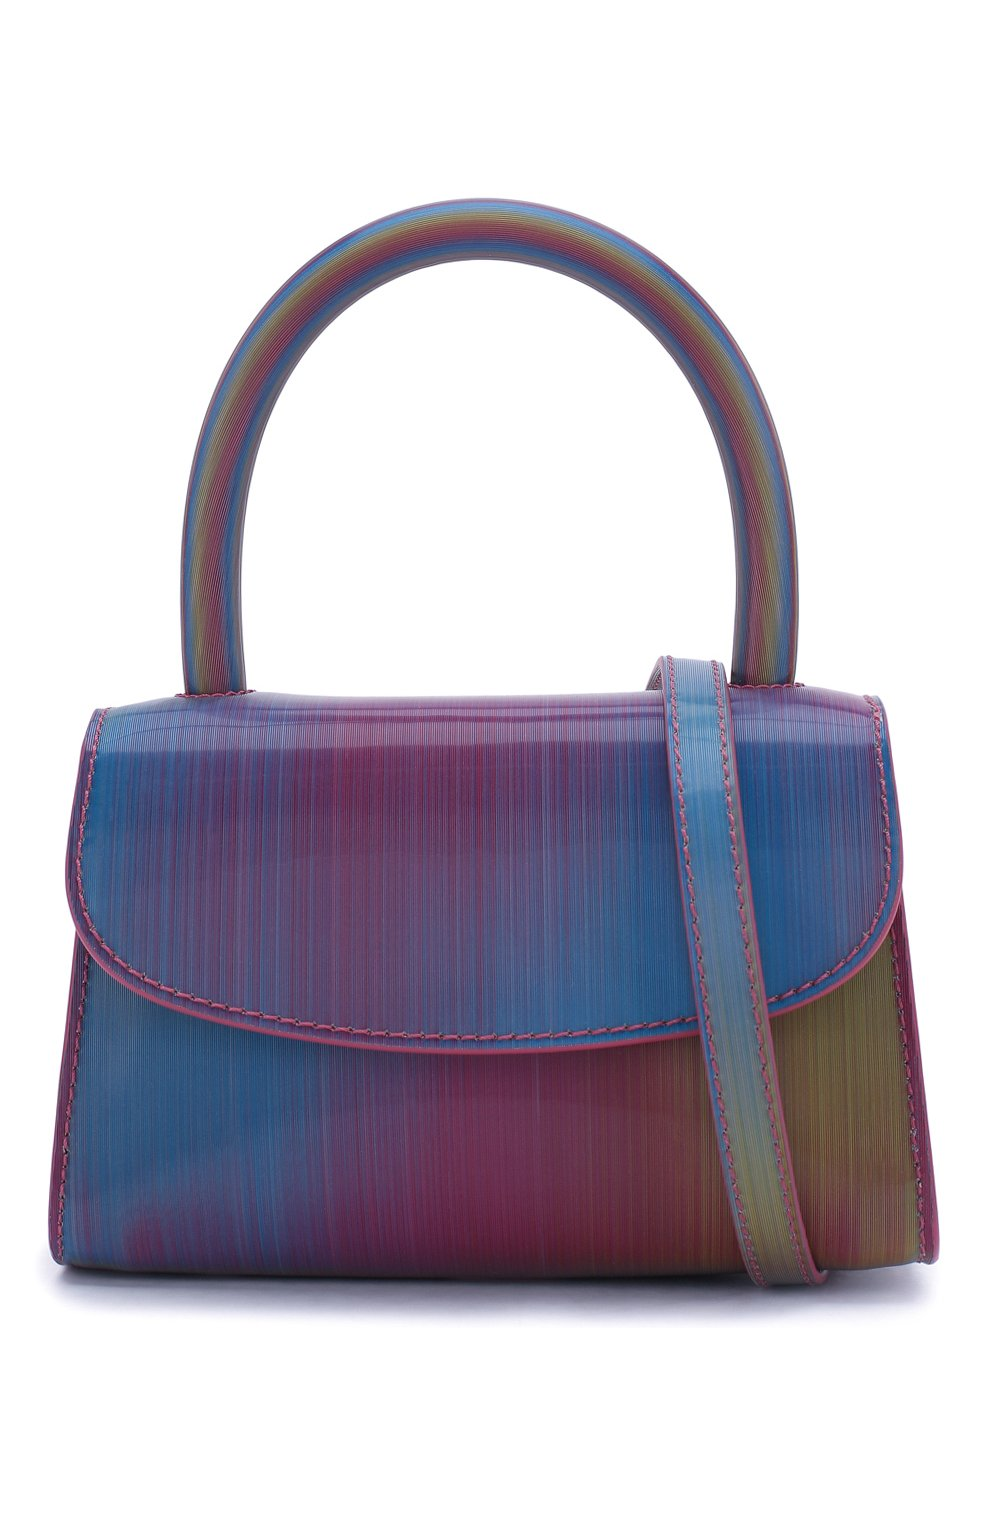 Женская сумка mini BY FAR разноцветного цвета, арт. 20SSMINARNLSMA   Фото 6 (Сумки-технические: Сумки через плечо, Сумки top-handle; Материал: Натуральная кожа; Размер: mini; Ремень/цепочка: На ремешке)